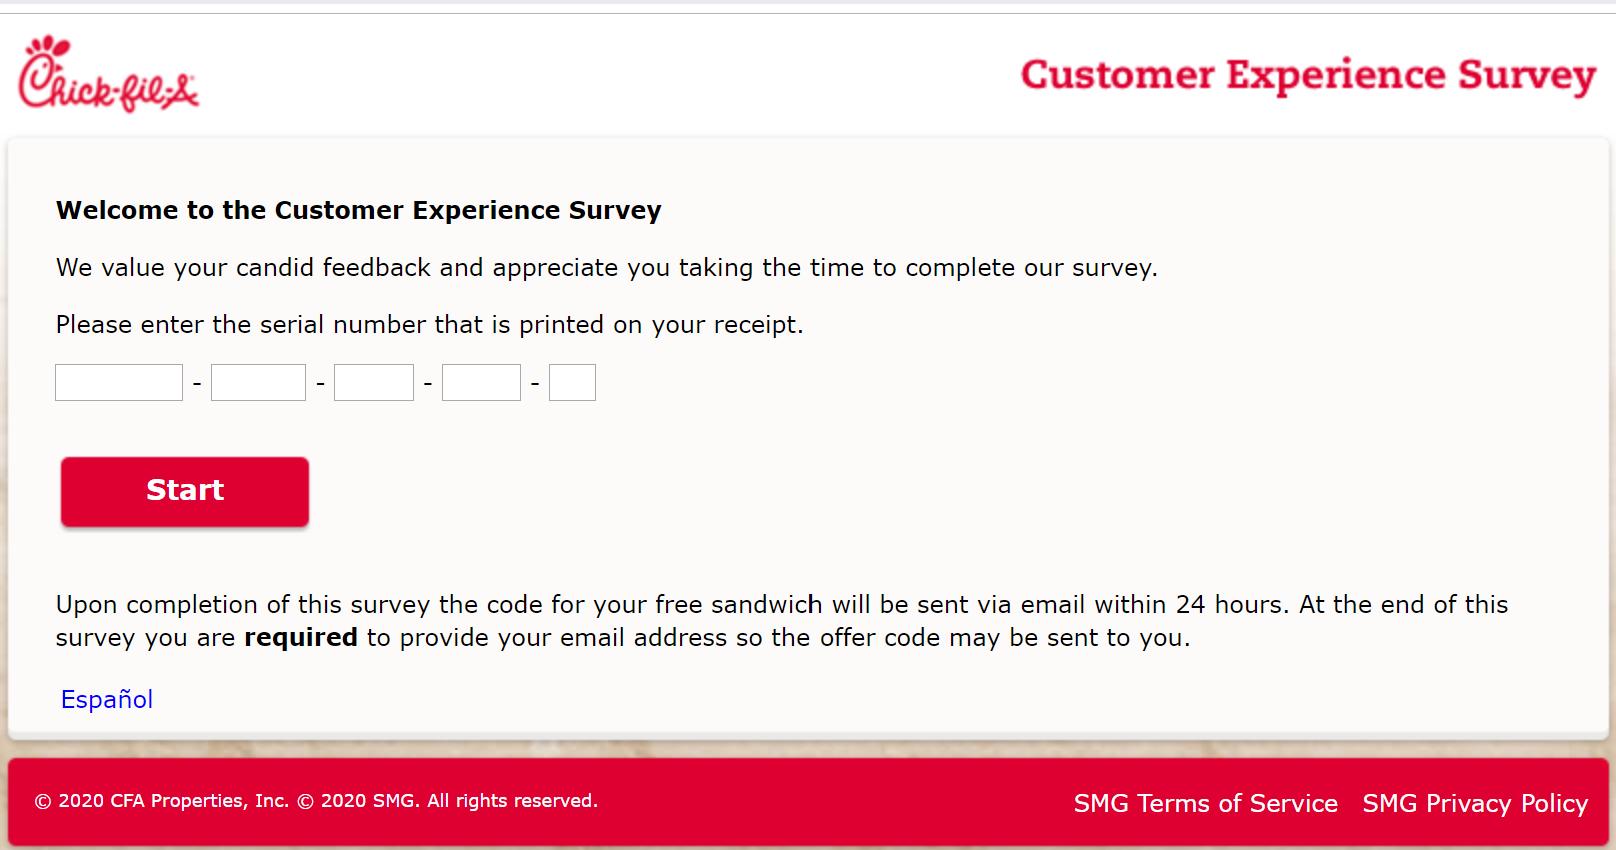 www.mycfavisit.com survey get a free sandwich